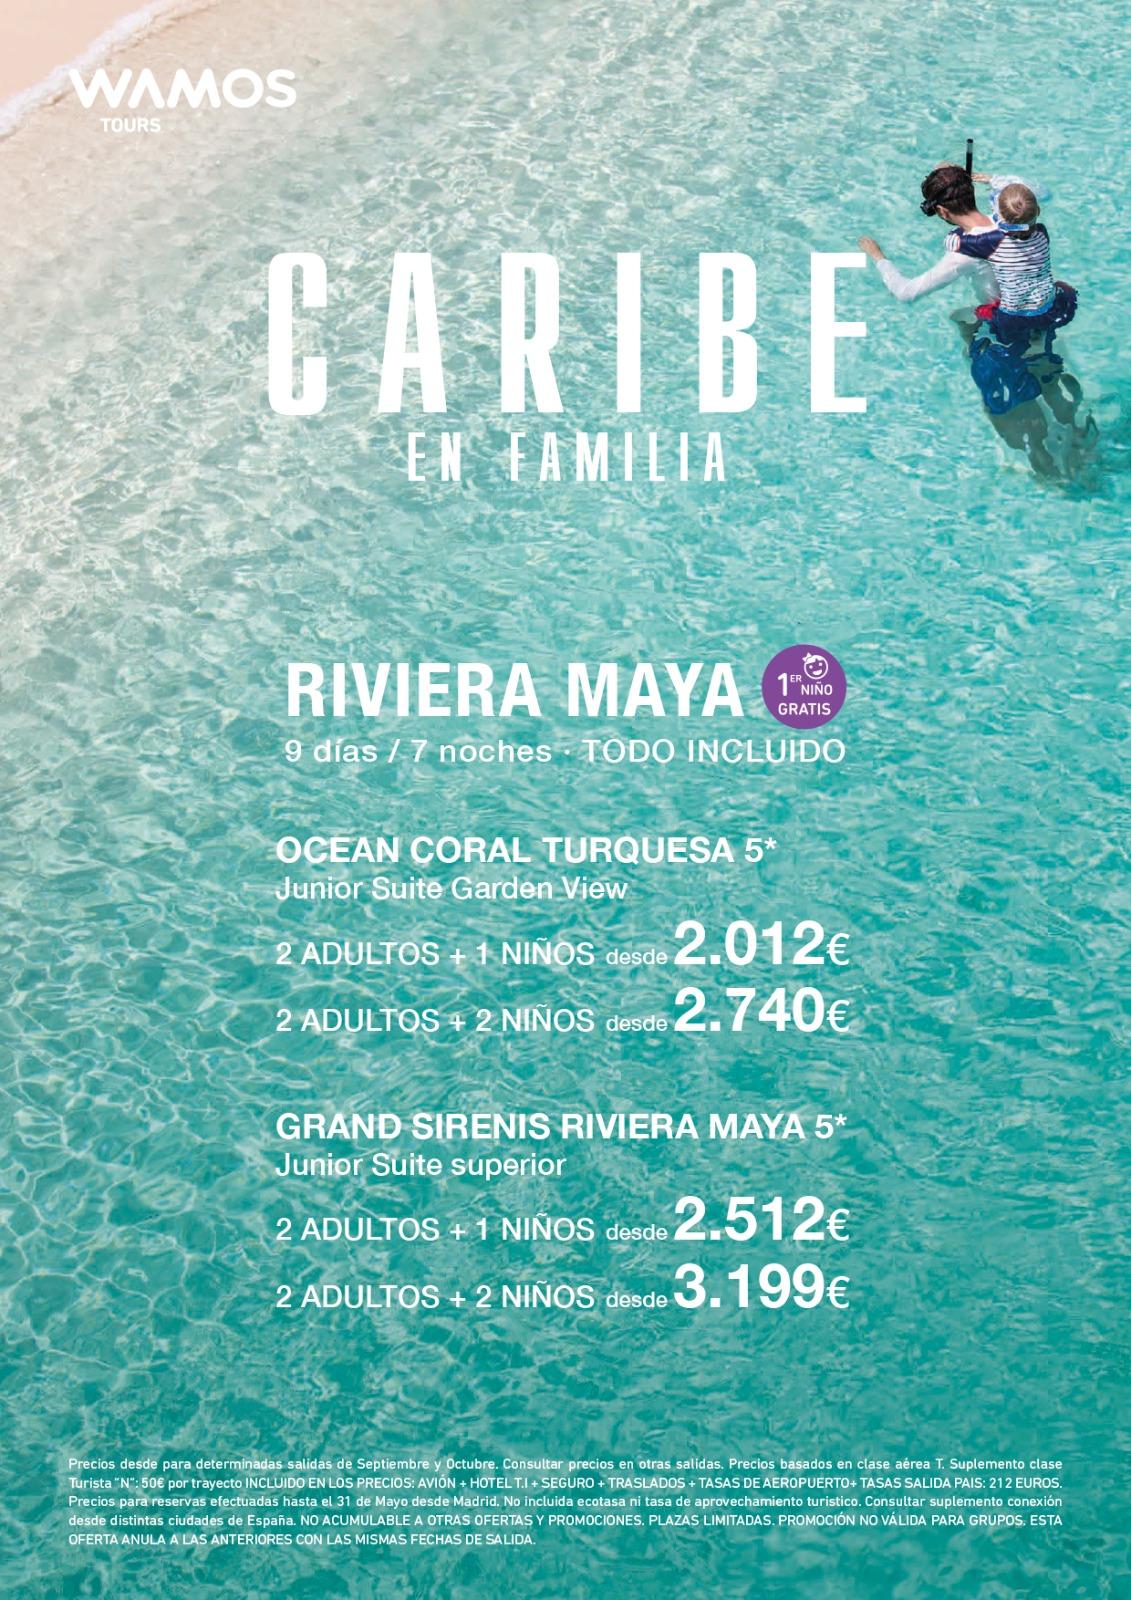 Superoferta Wamos Tours Familias Riviera Maya Verano 2021